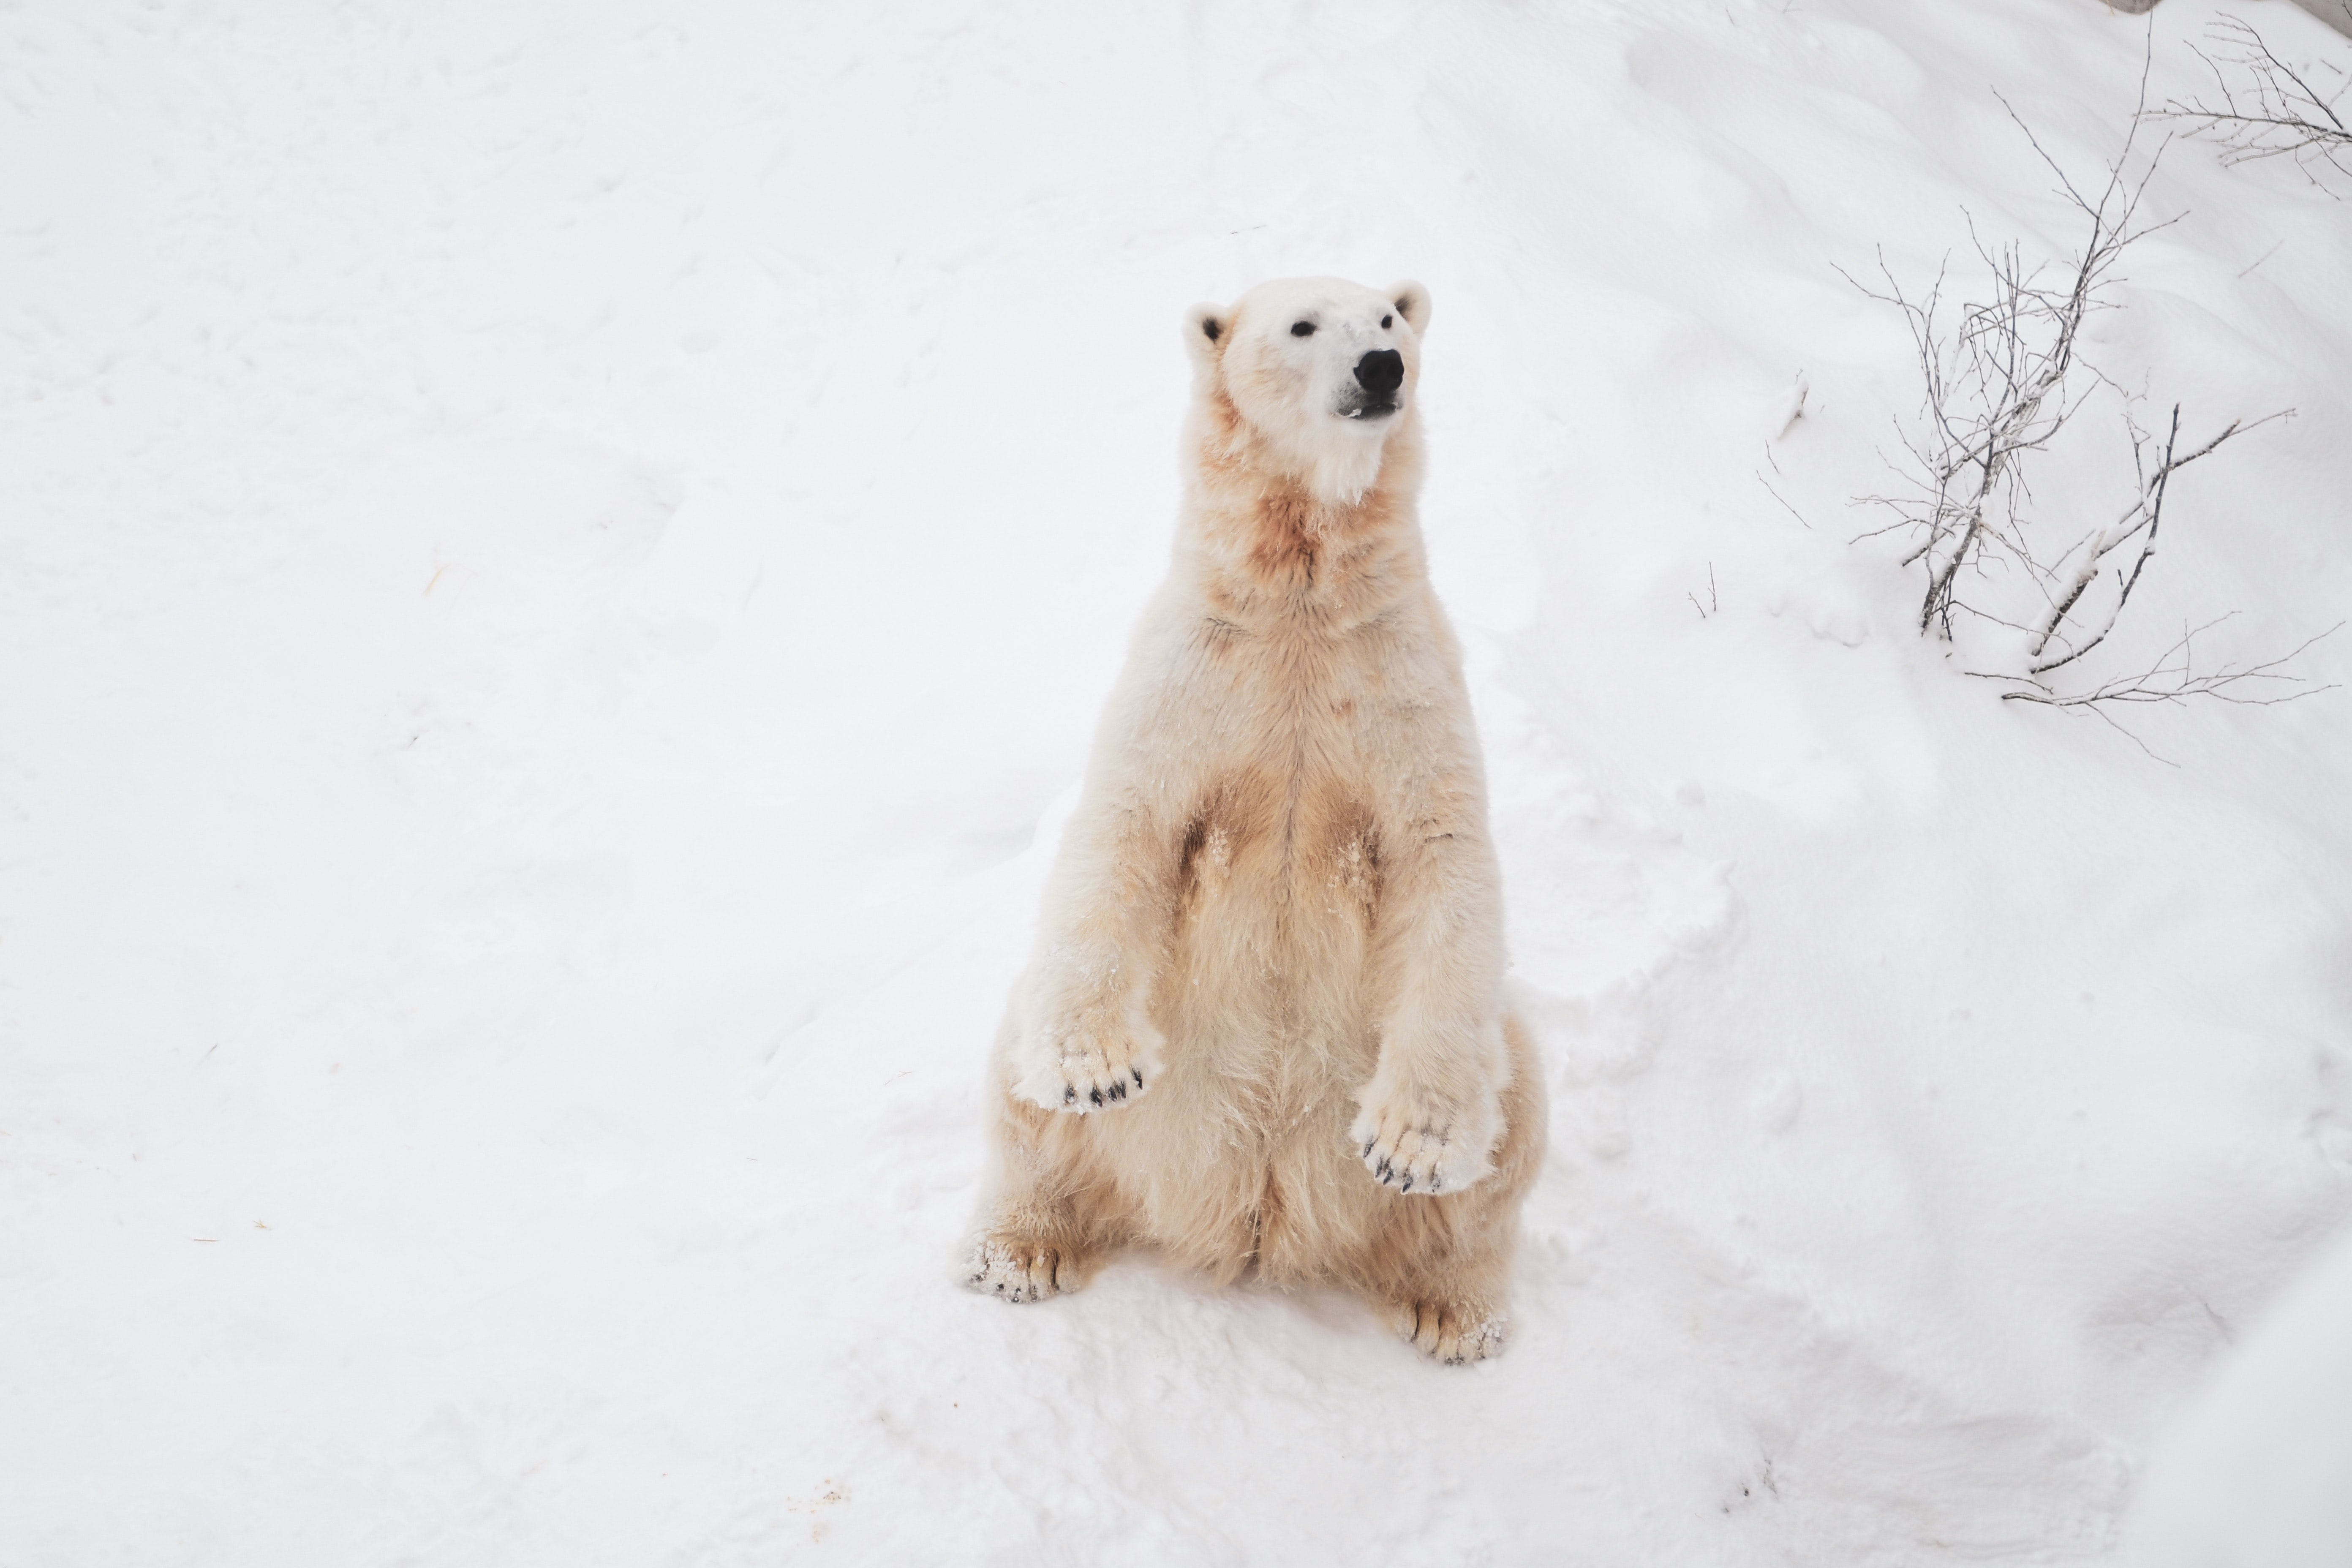 white and brown animal plush toy